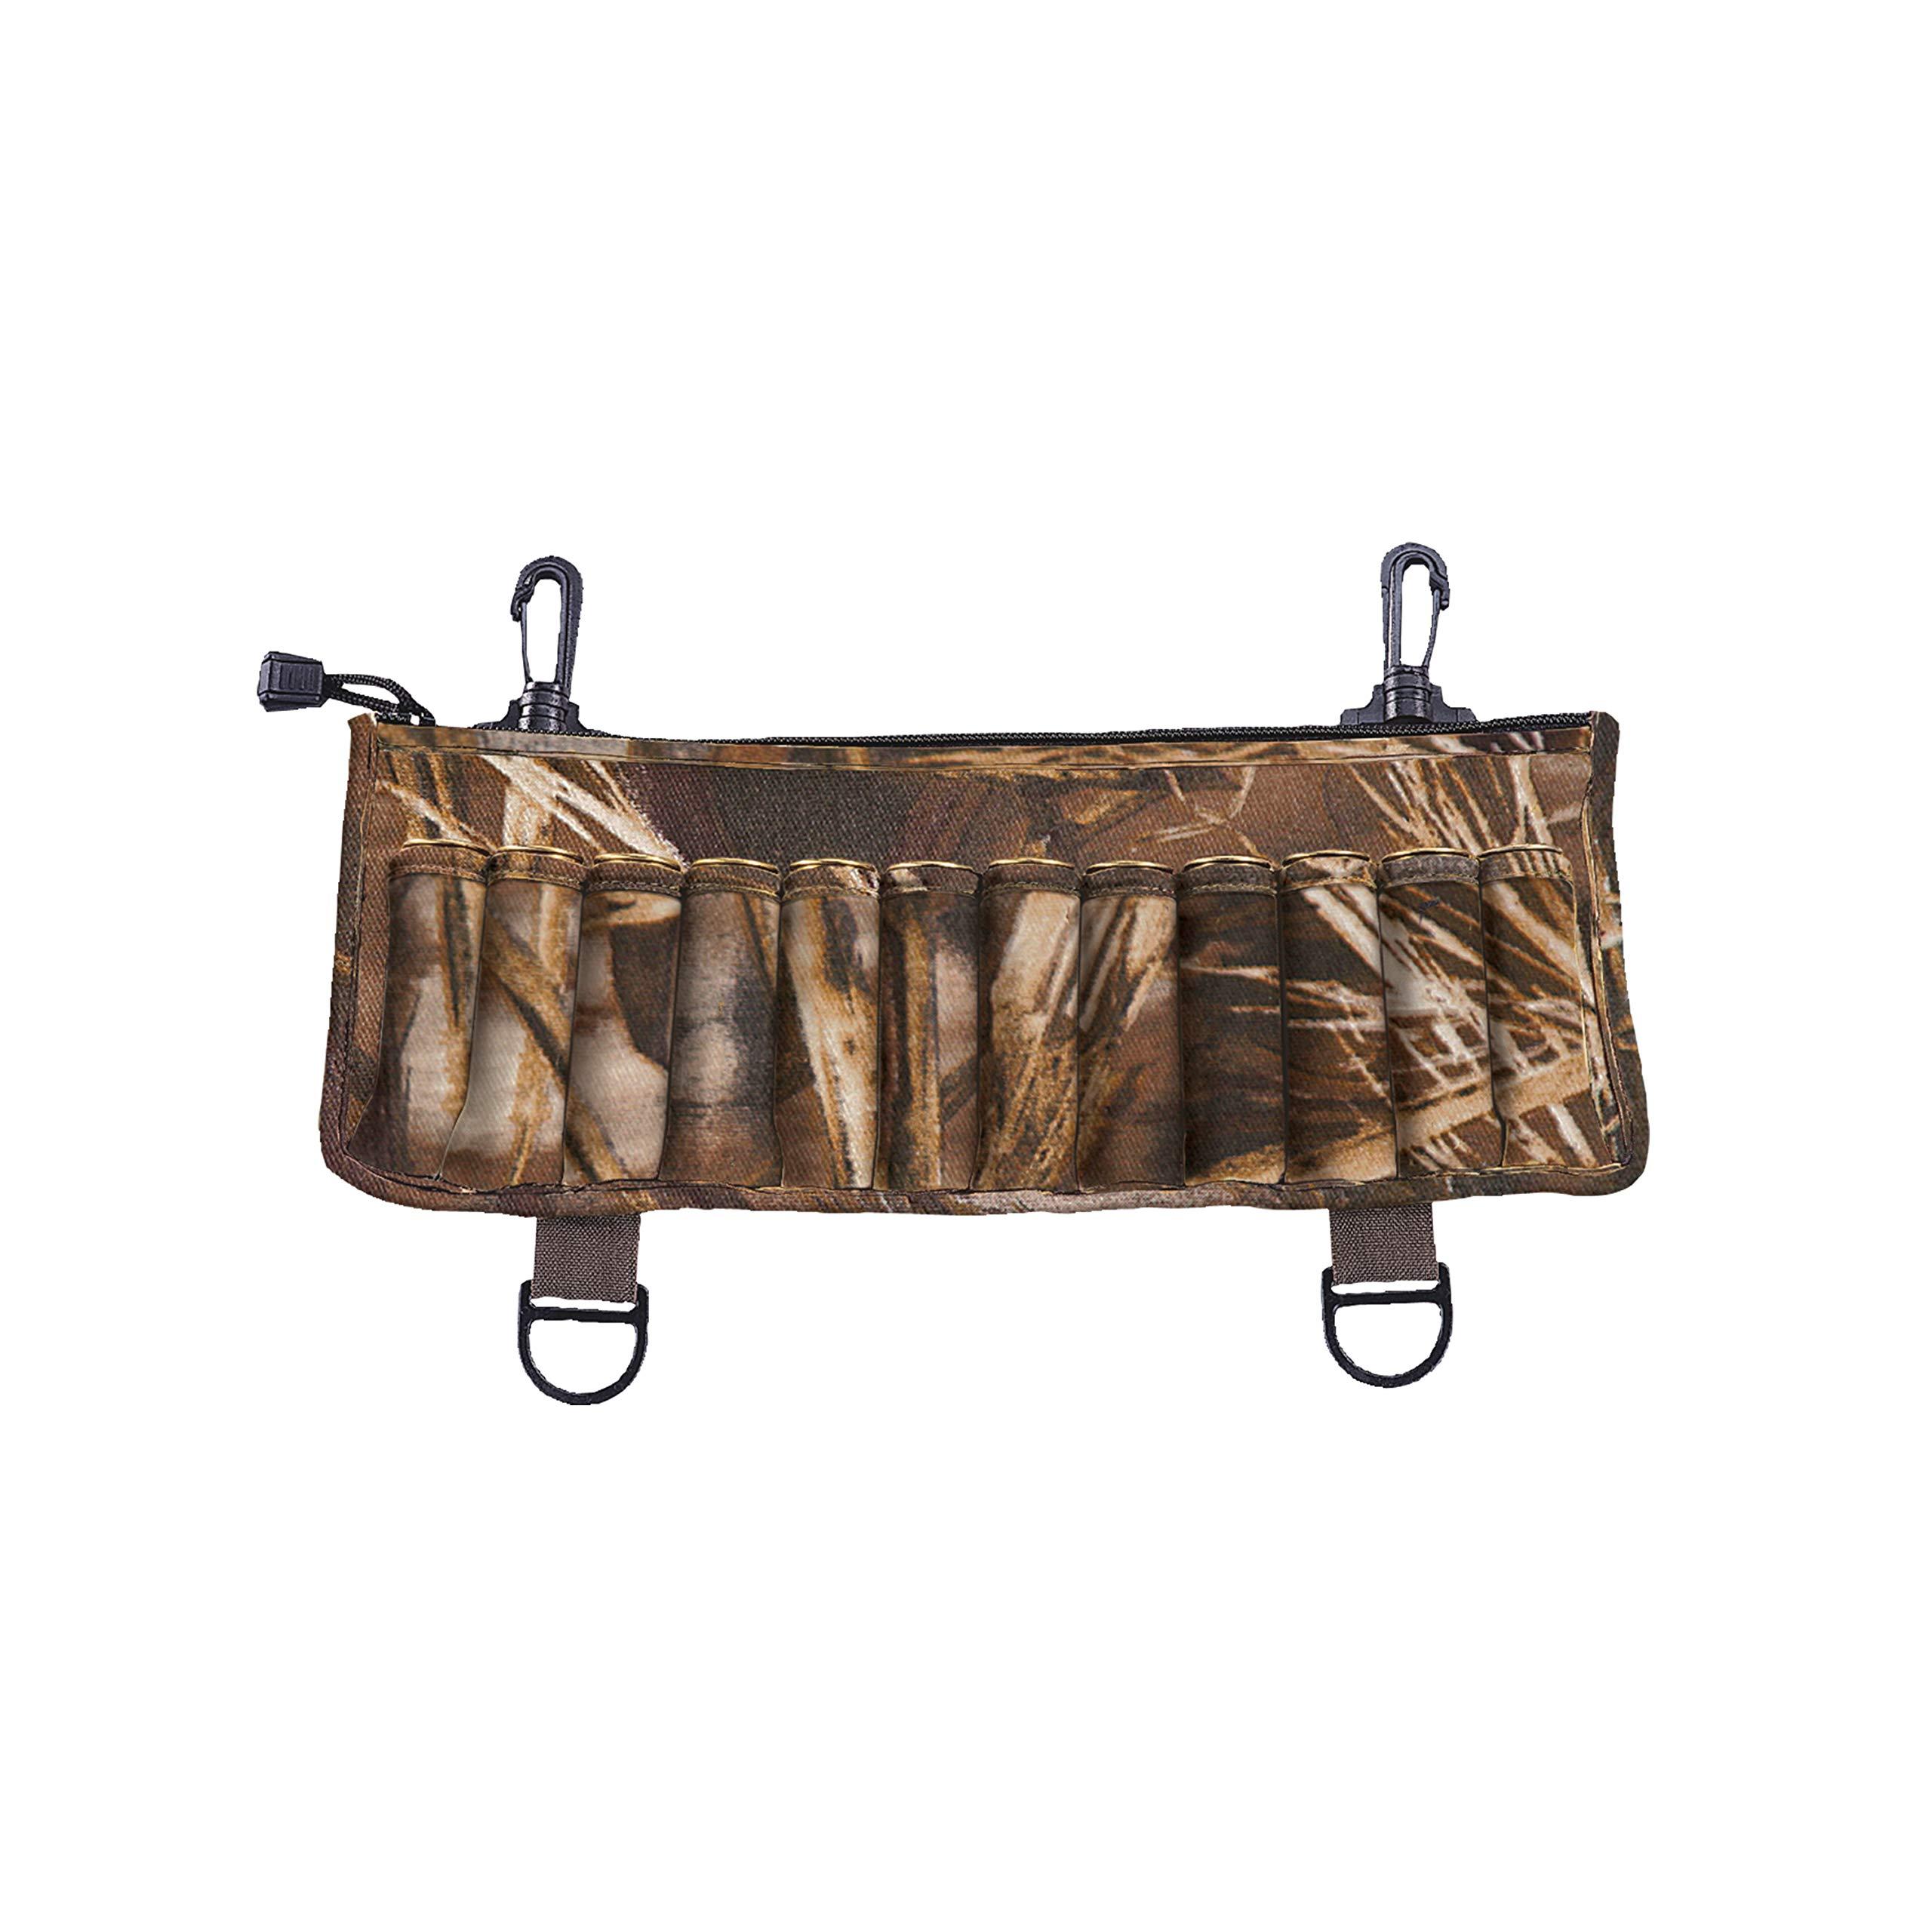 Allen Neoprene Clip-On 24 Shotshell Holder, Realtree MAX-5 Camo by Allen Company